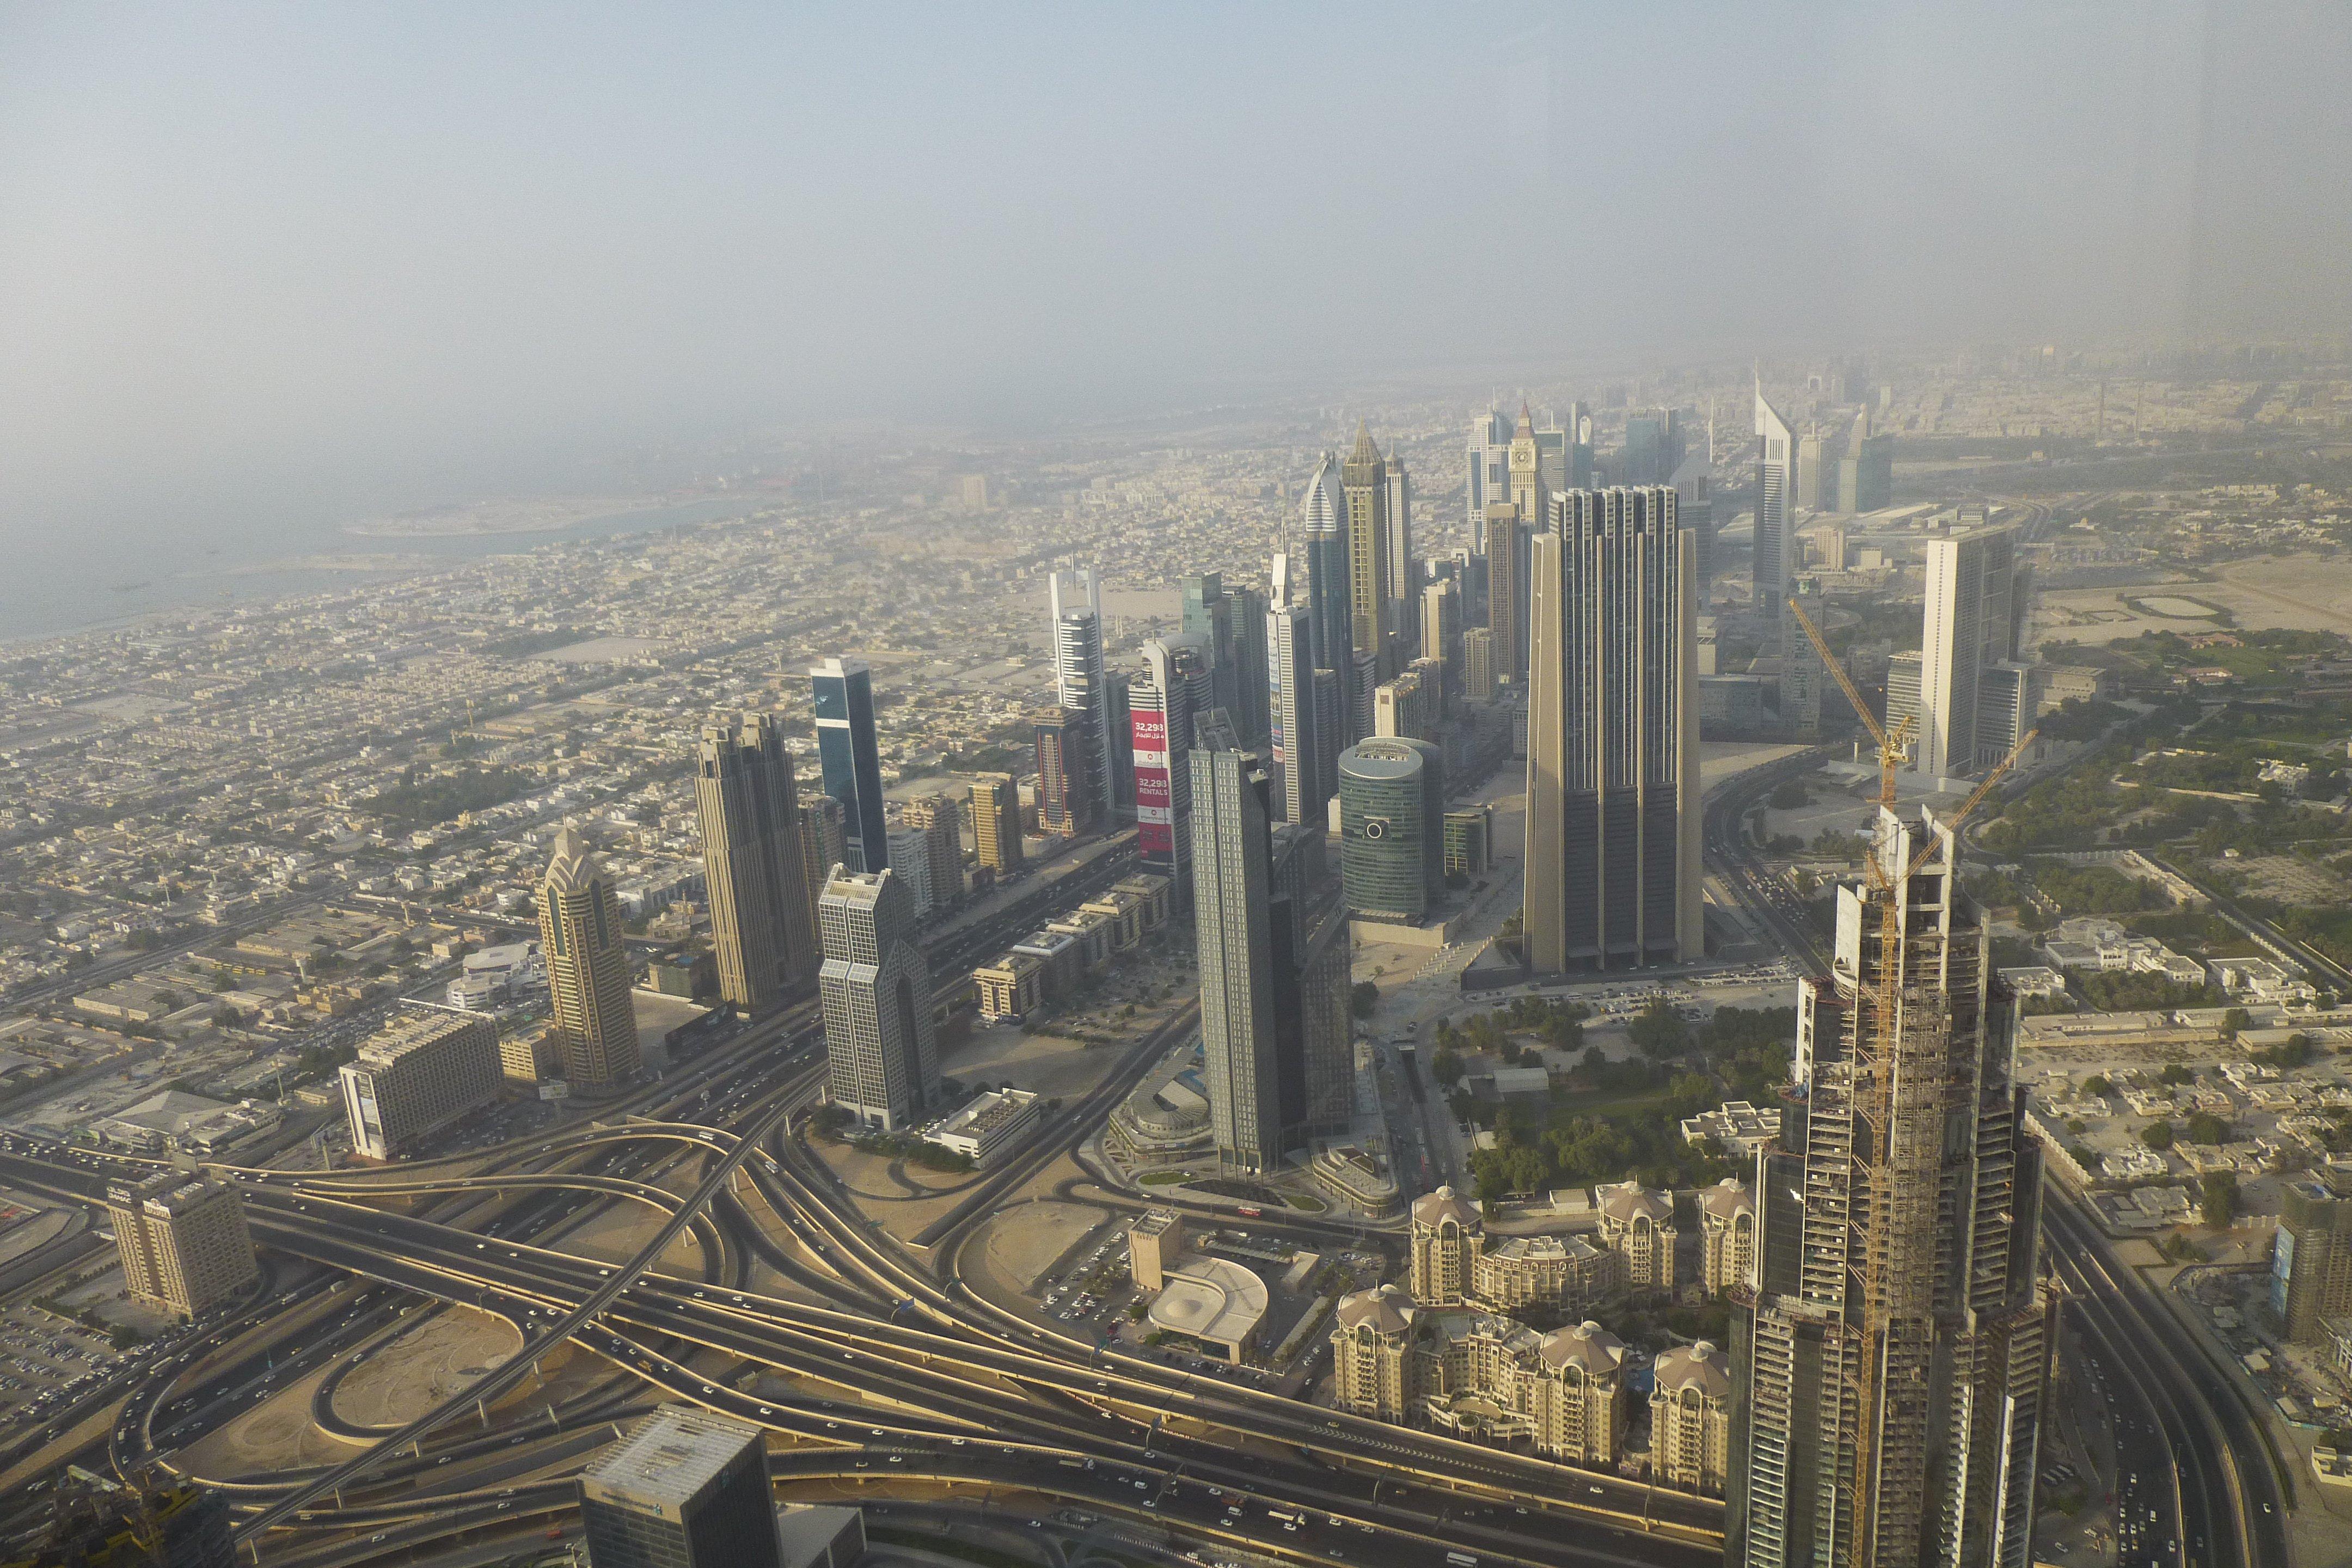 Burj Khalifa At the Top Level 124